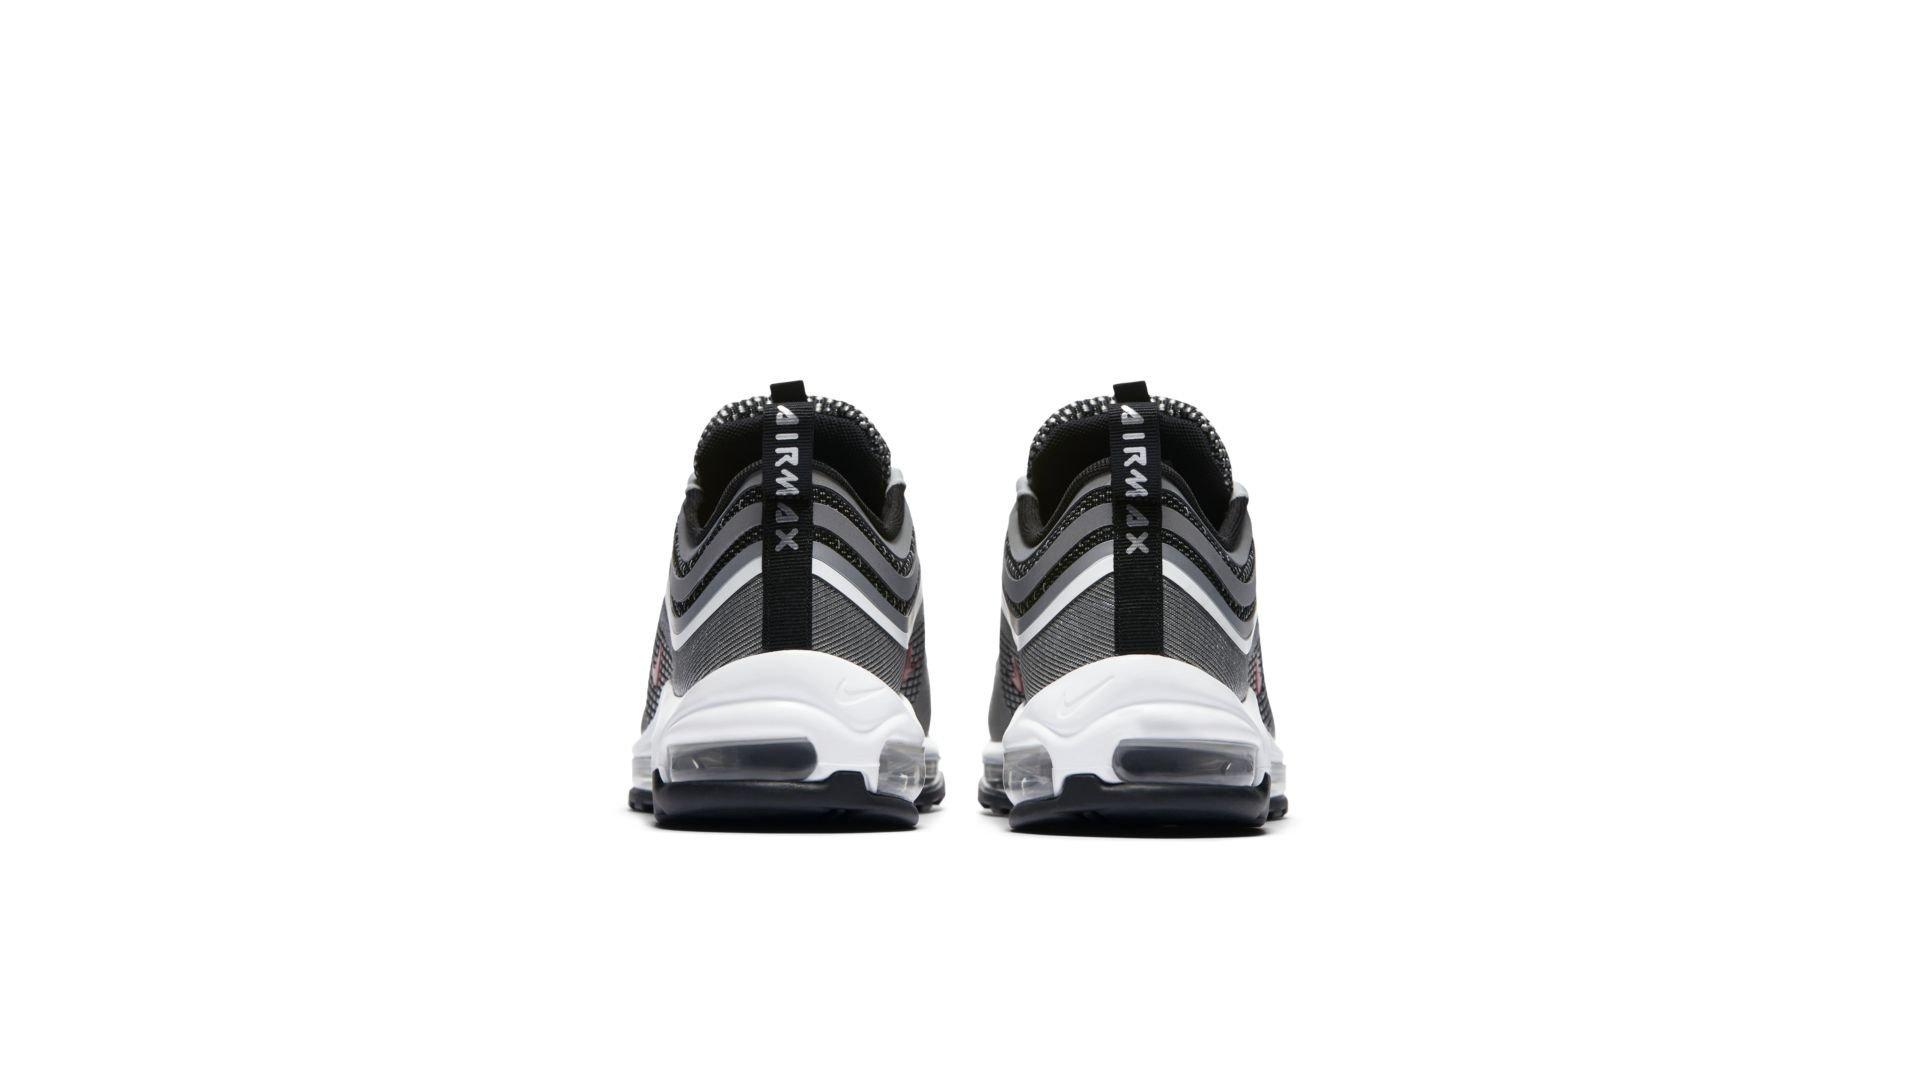 Nike Wmns Air Max 97 Ultra 17 Silver Bullet (917704-002)